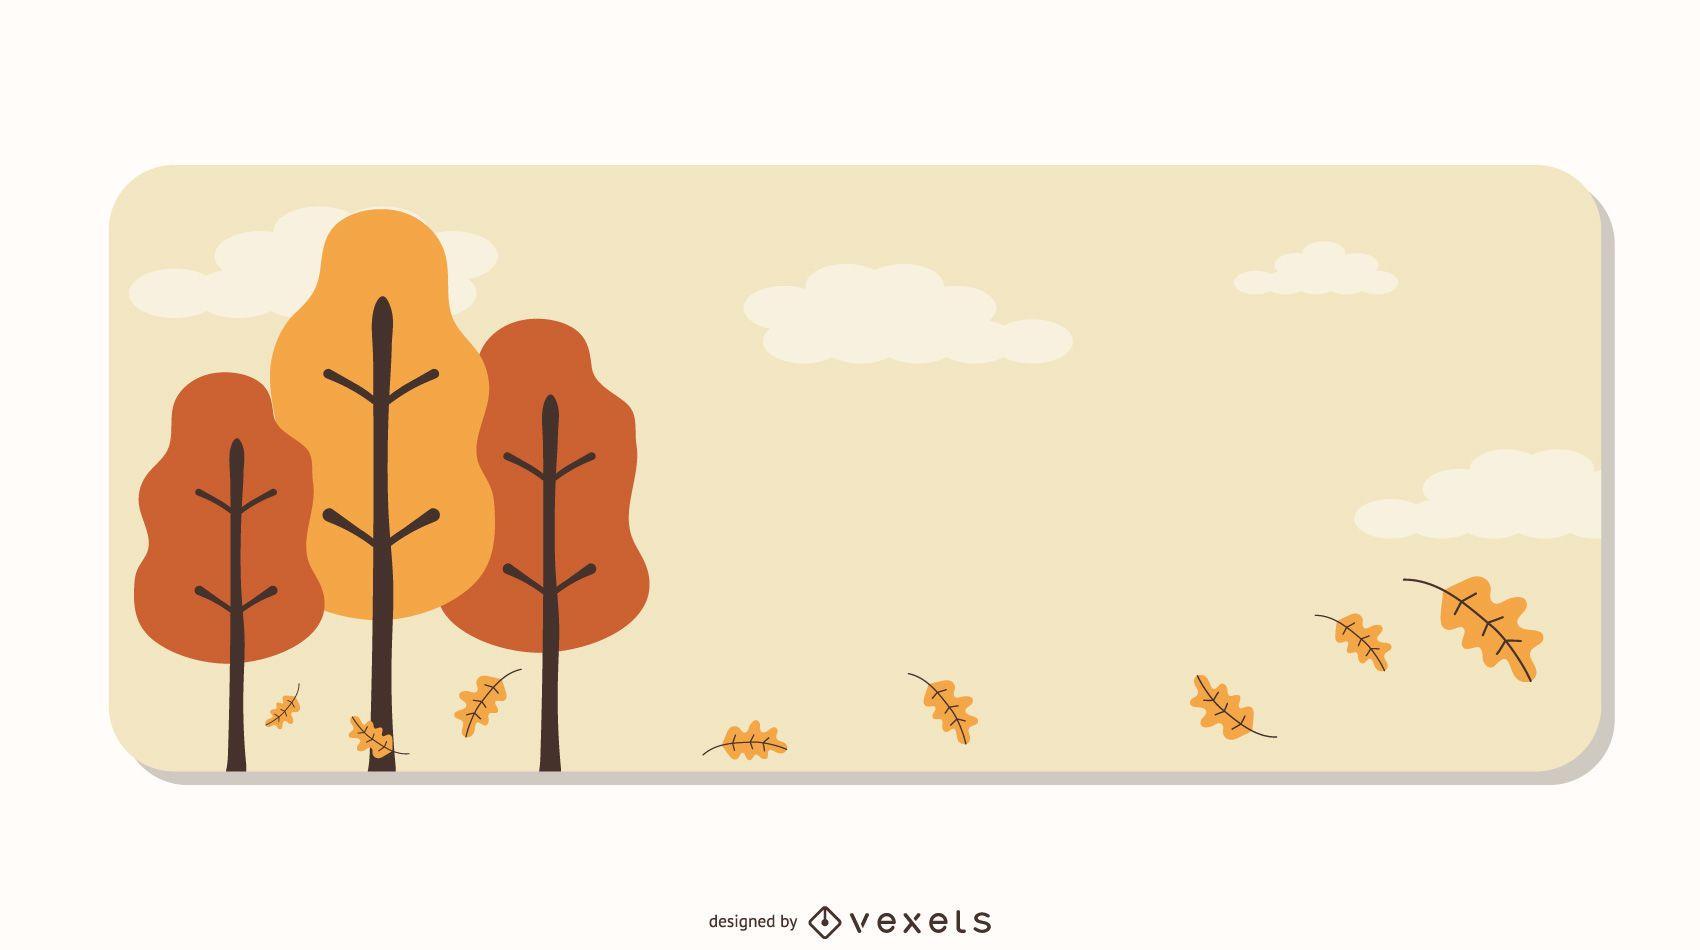 Trees Decorative Banner Vector Design